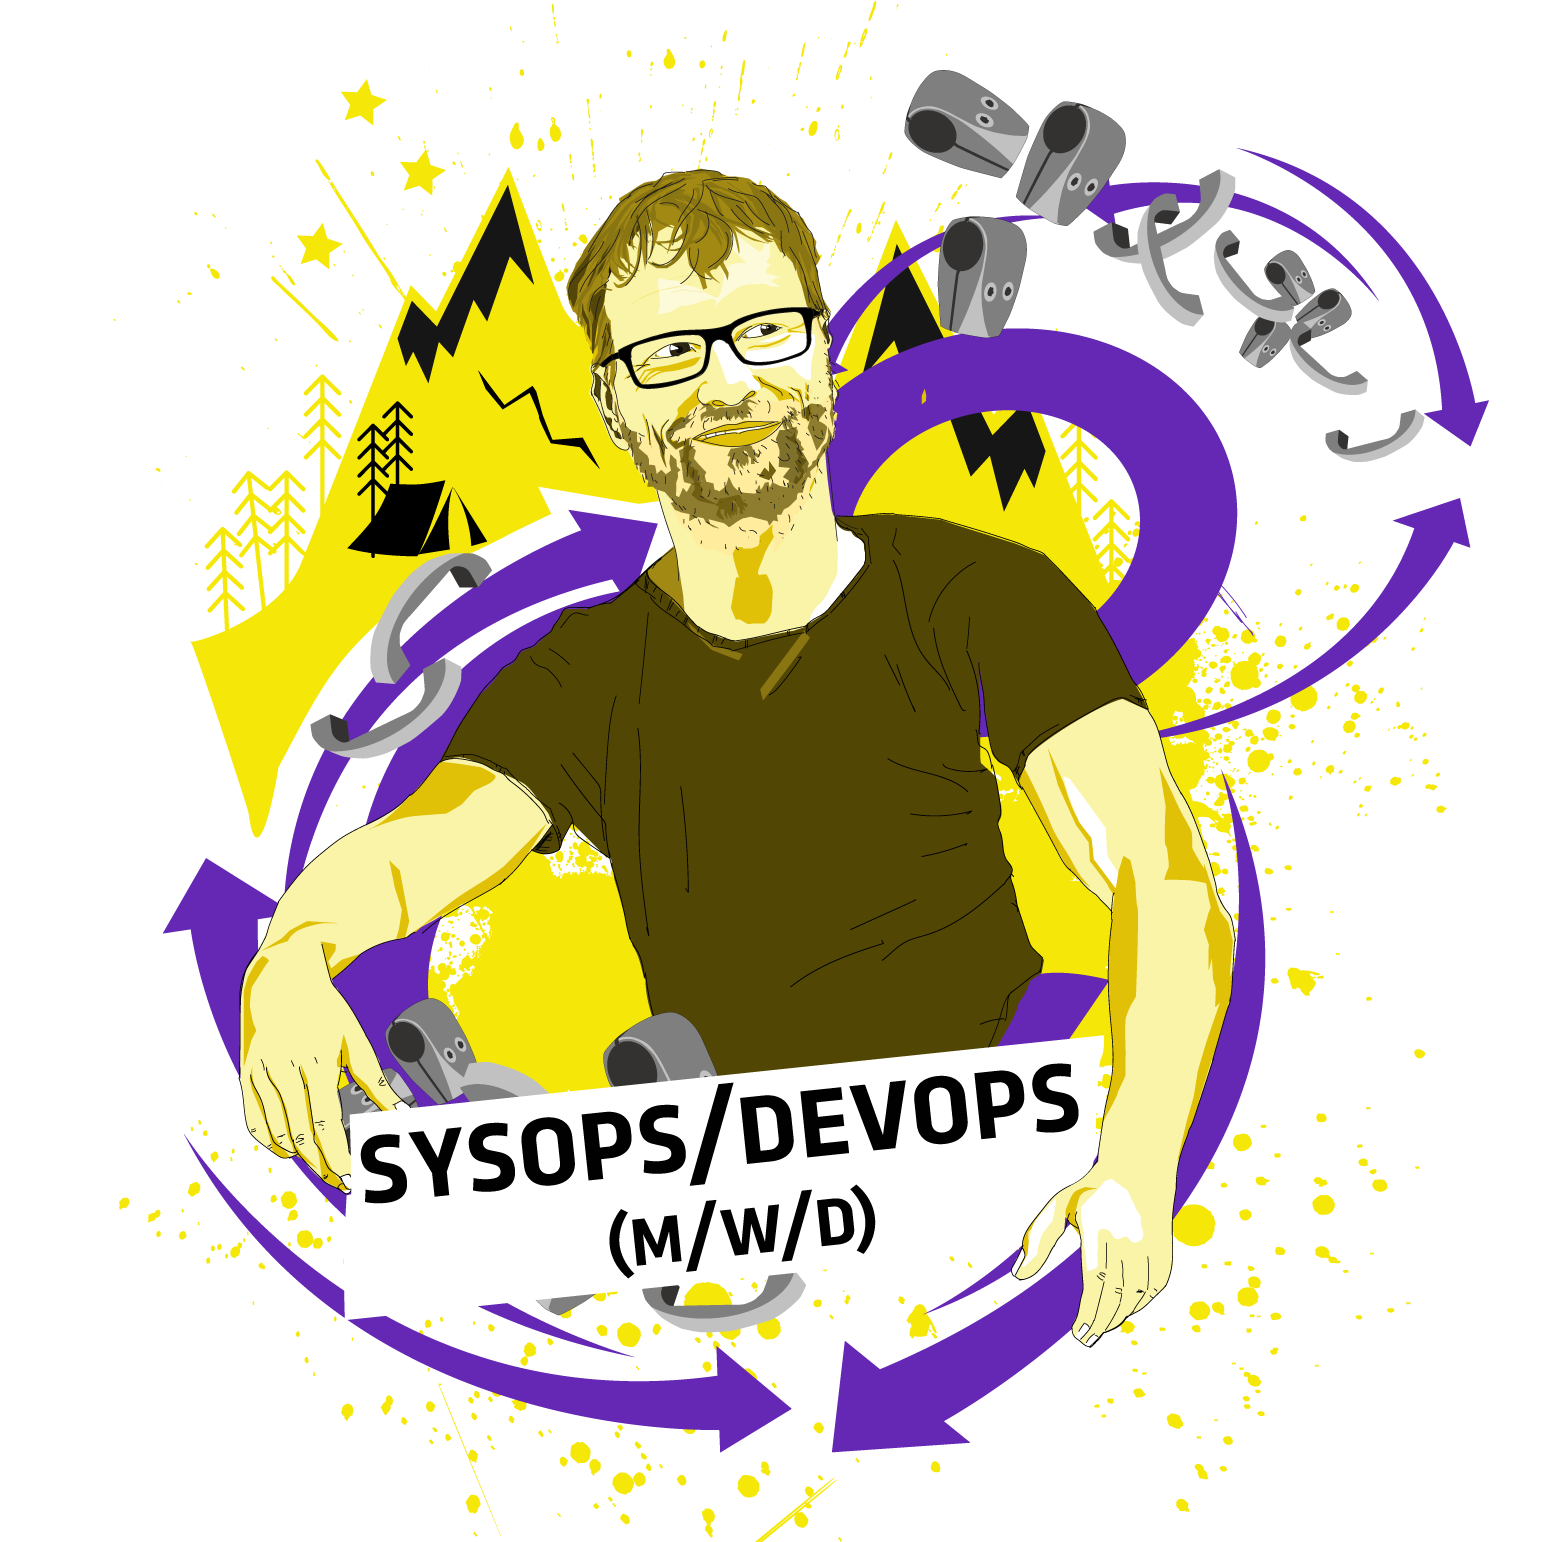 SysOps/DevOps Blackbit